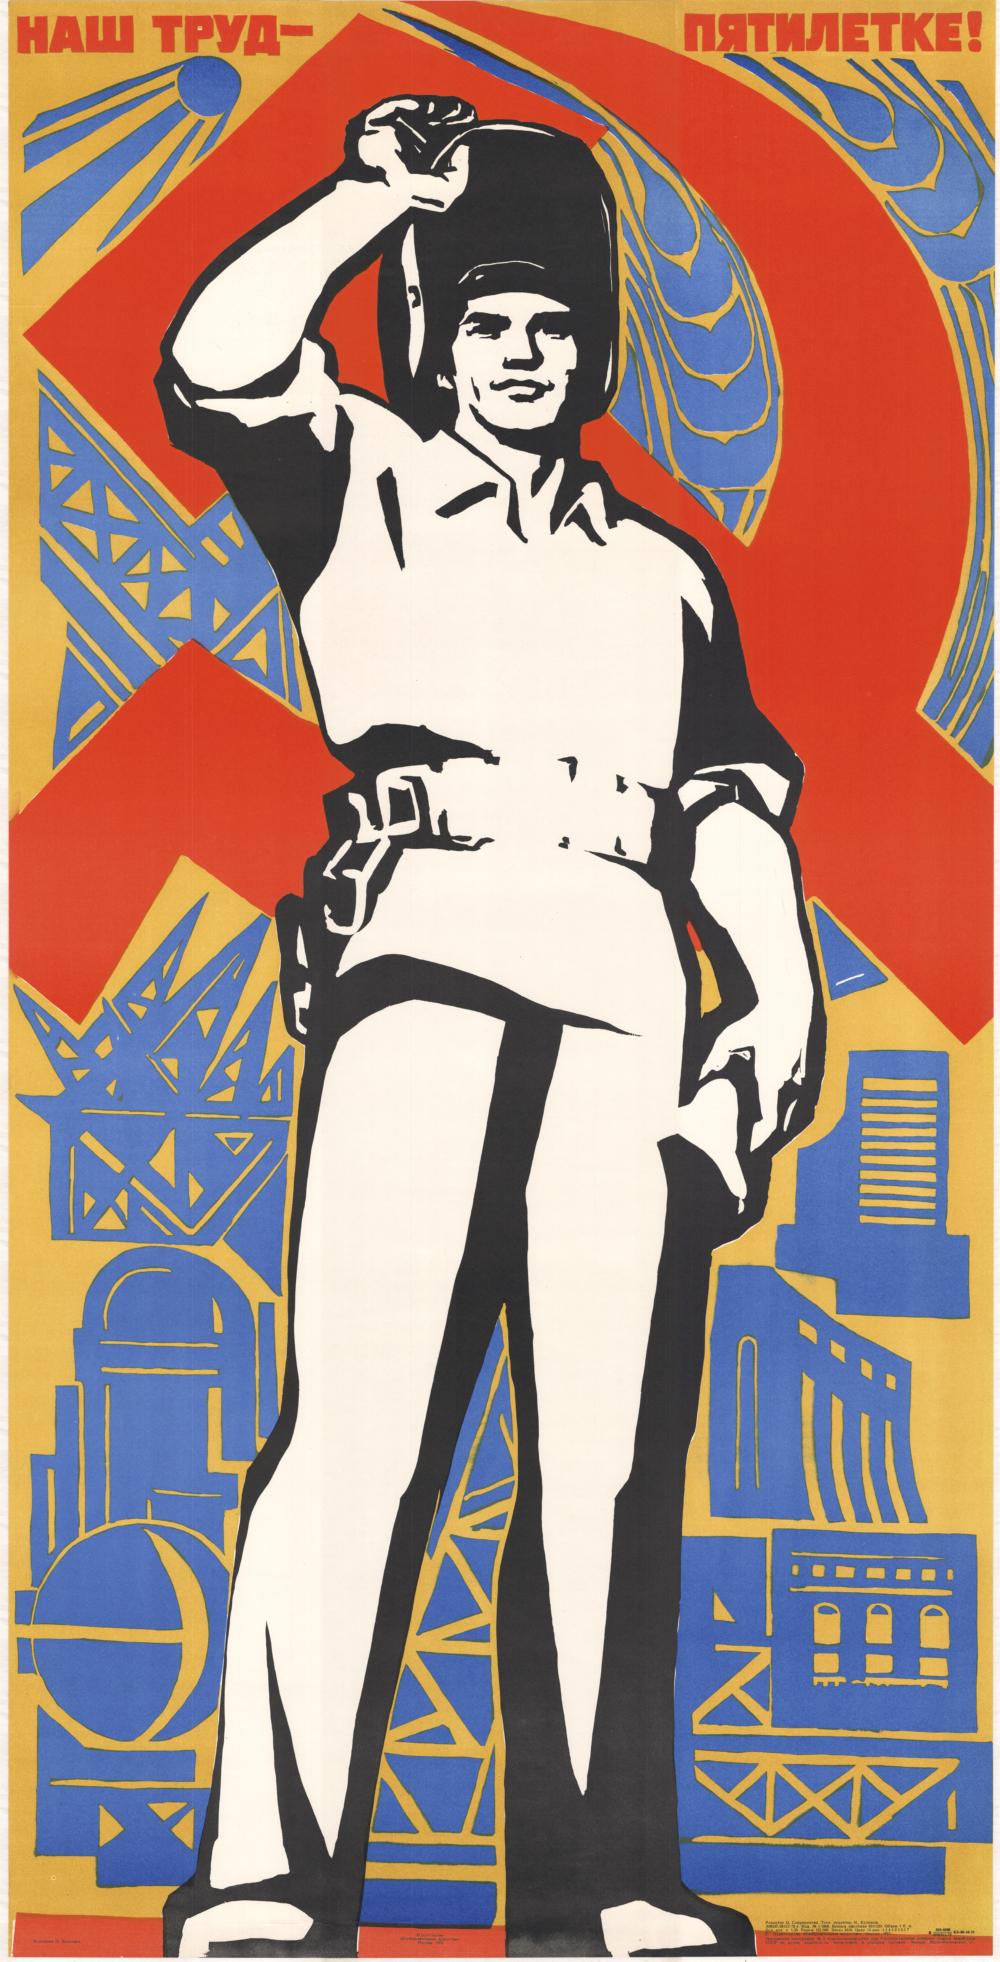 Плакат «Наш труд – пятилетке!»